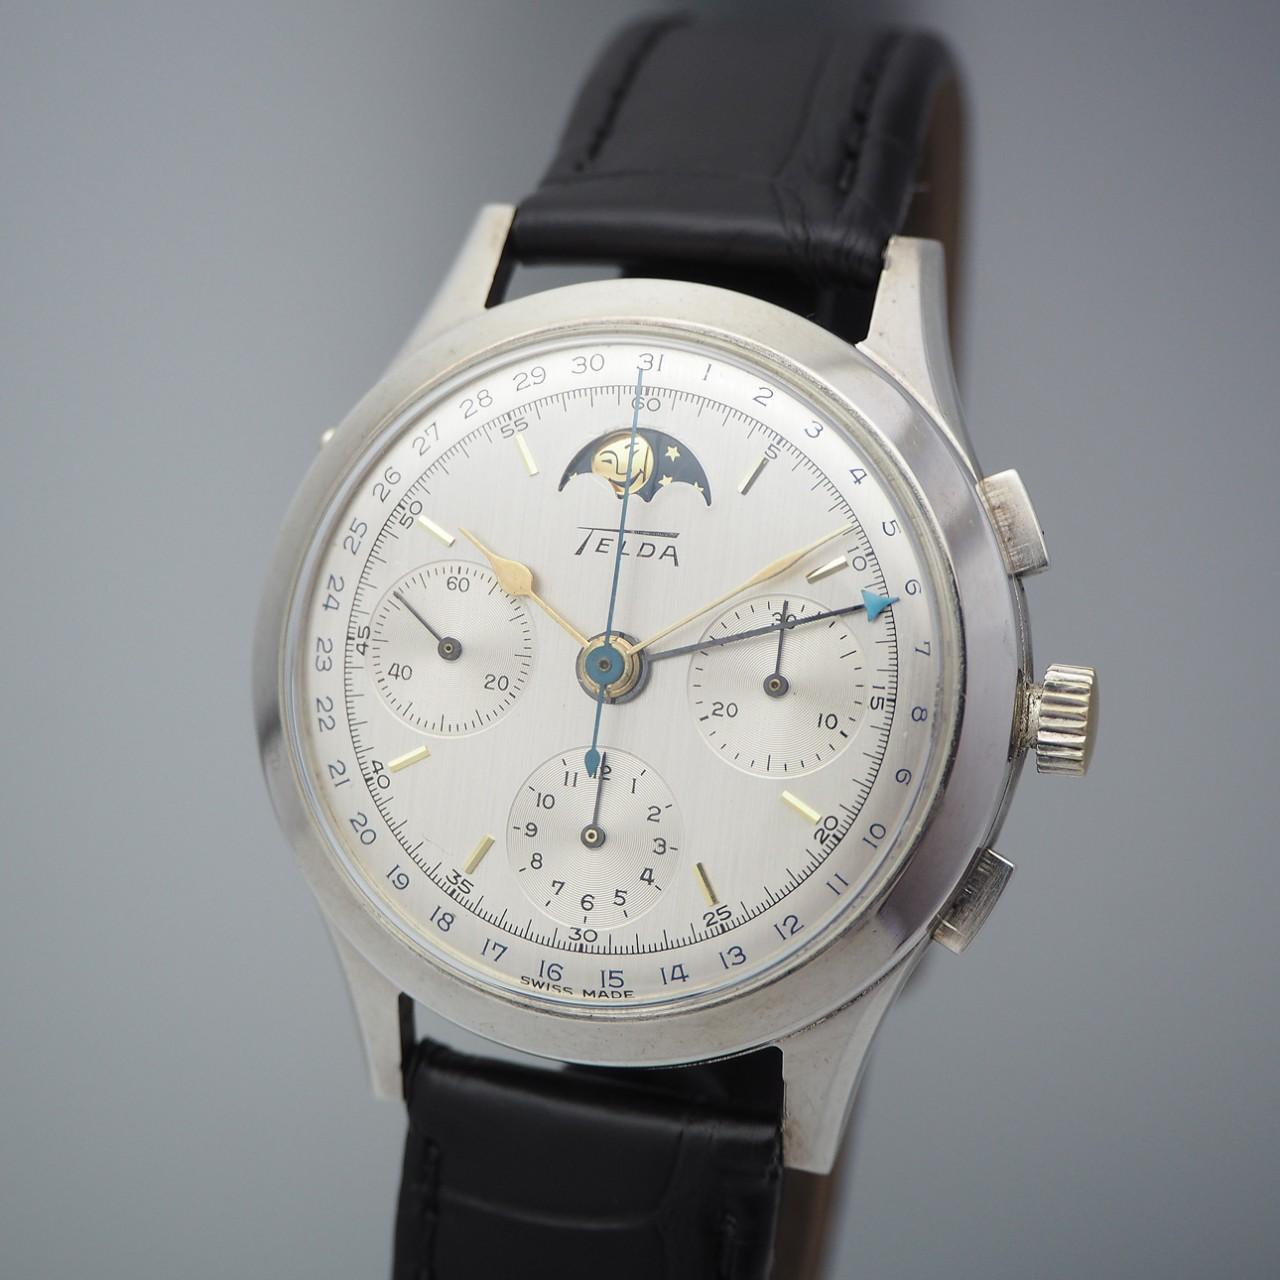 Telda Chronograph Moonphase Vintage Limited Edition 130 , Silber 925/ Leder, Venus 187, ULTRA Rare